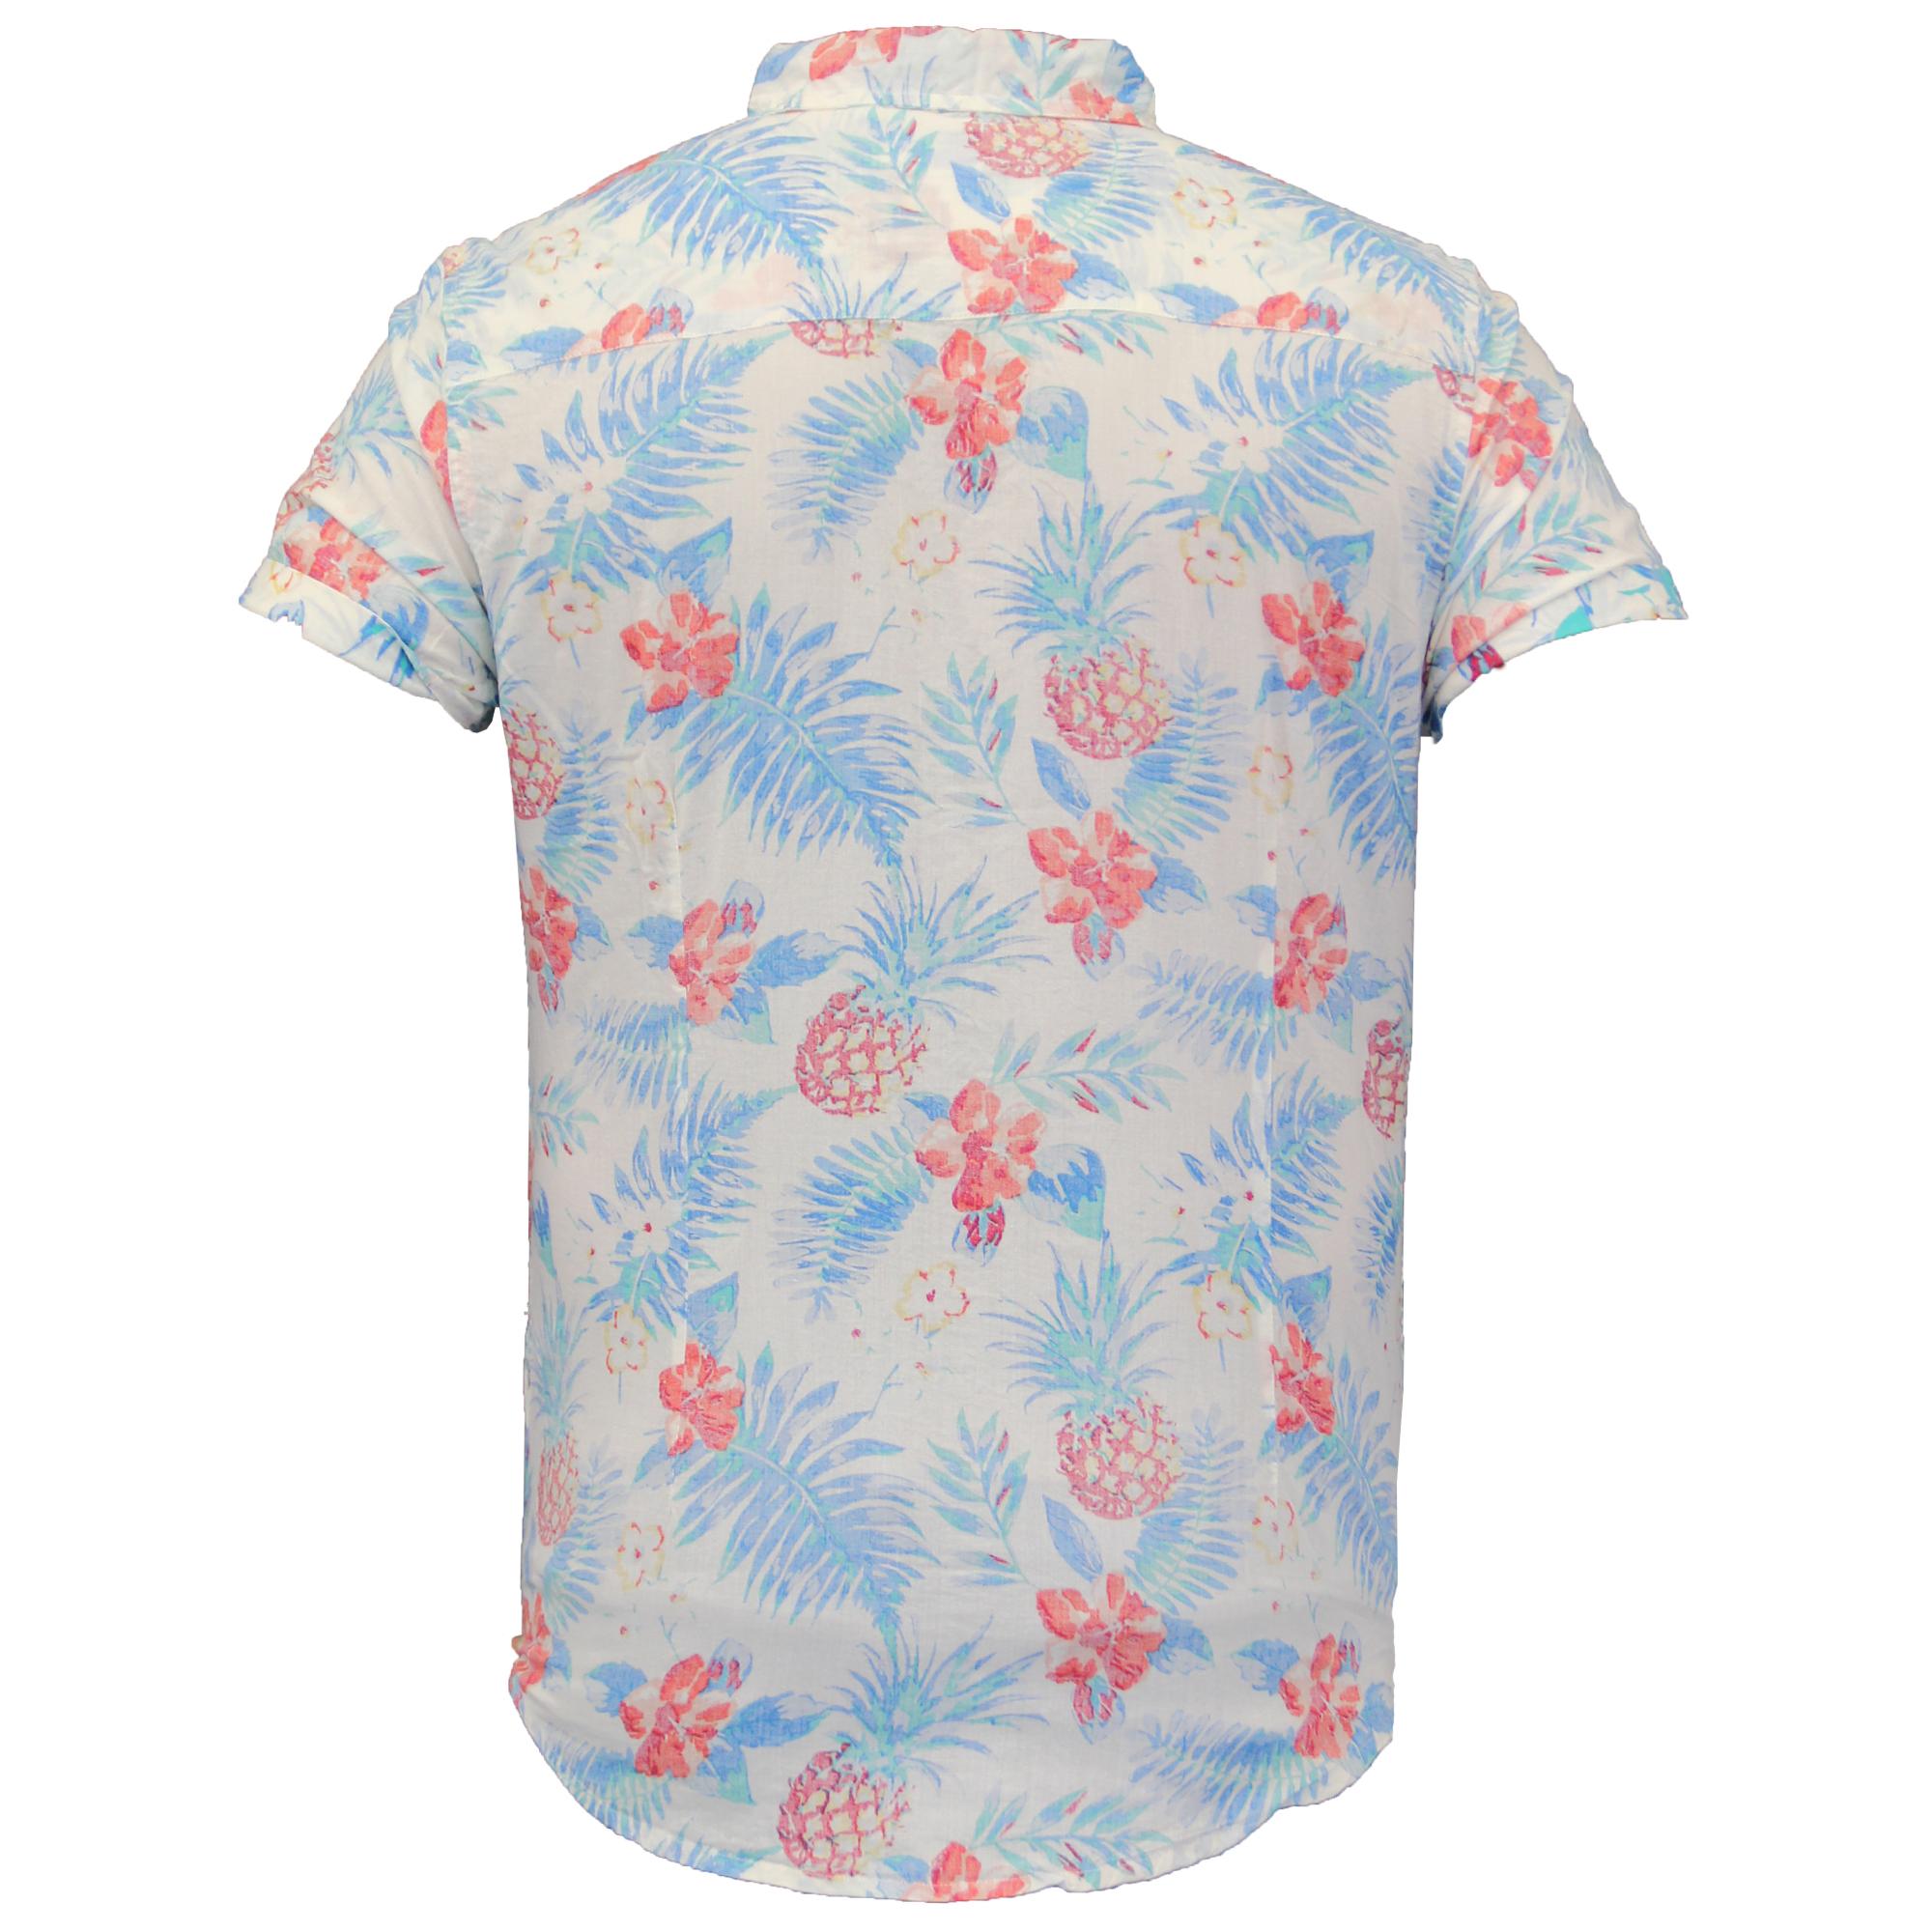 Mens hawaii floral shirt by soul star short sleeved ebay for Mens short sleeve floral shirt